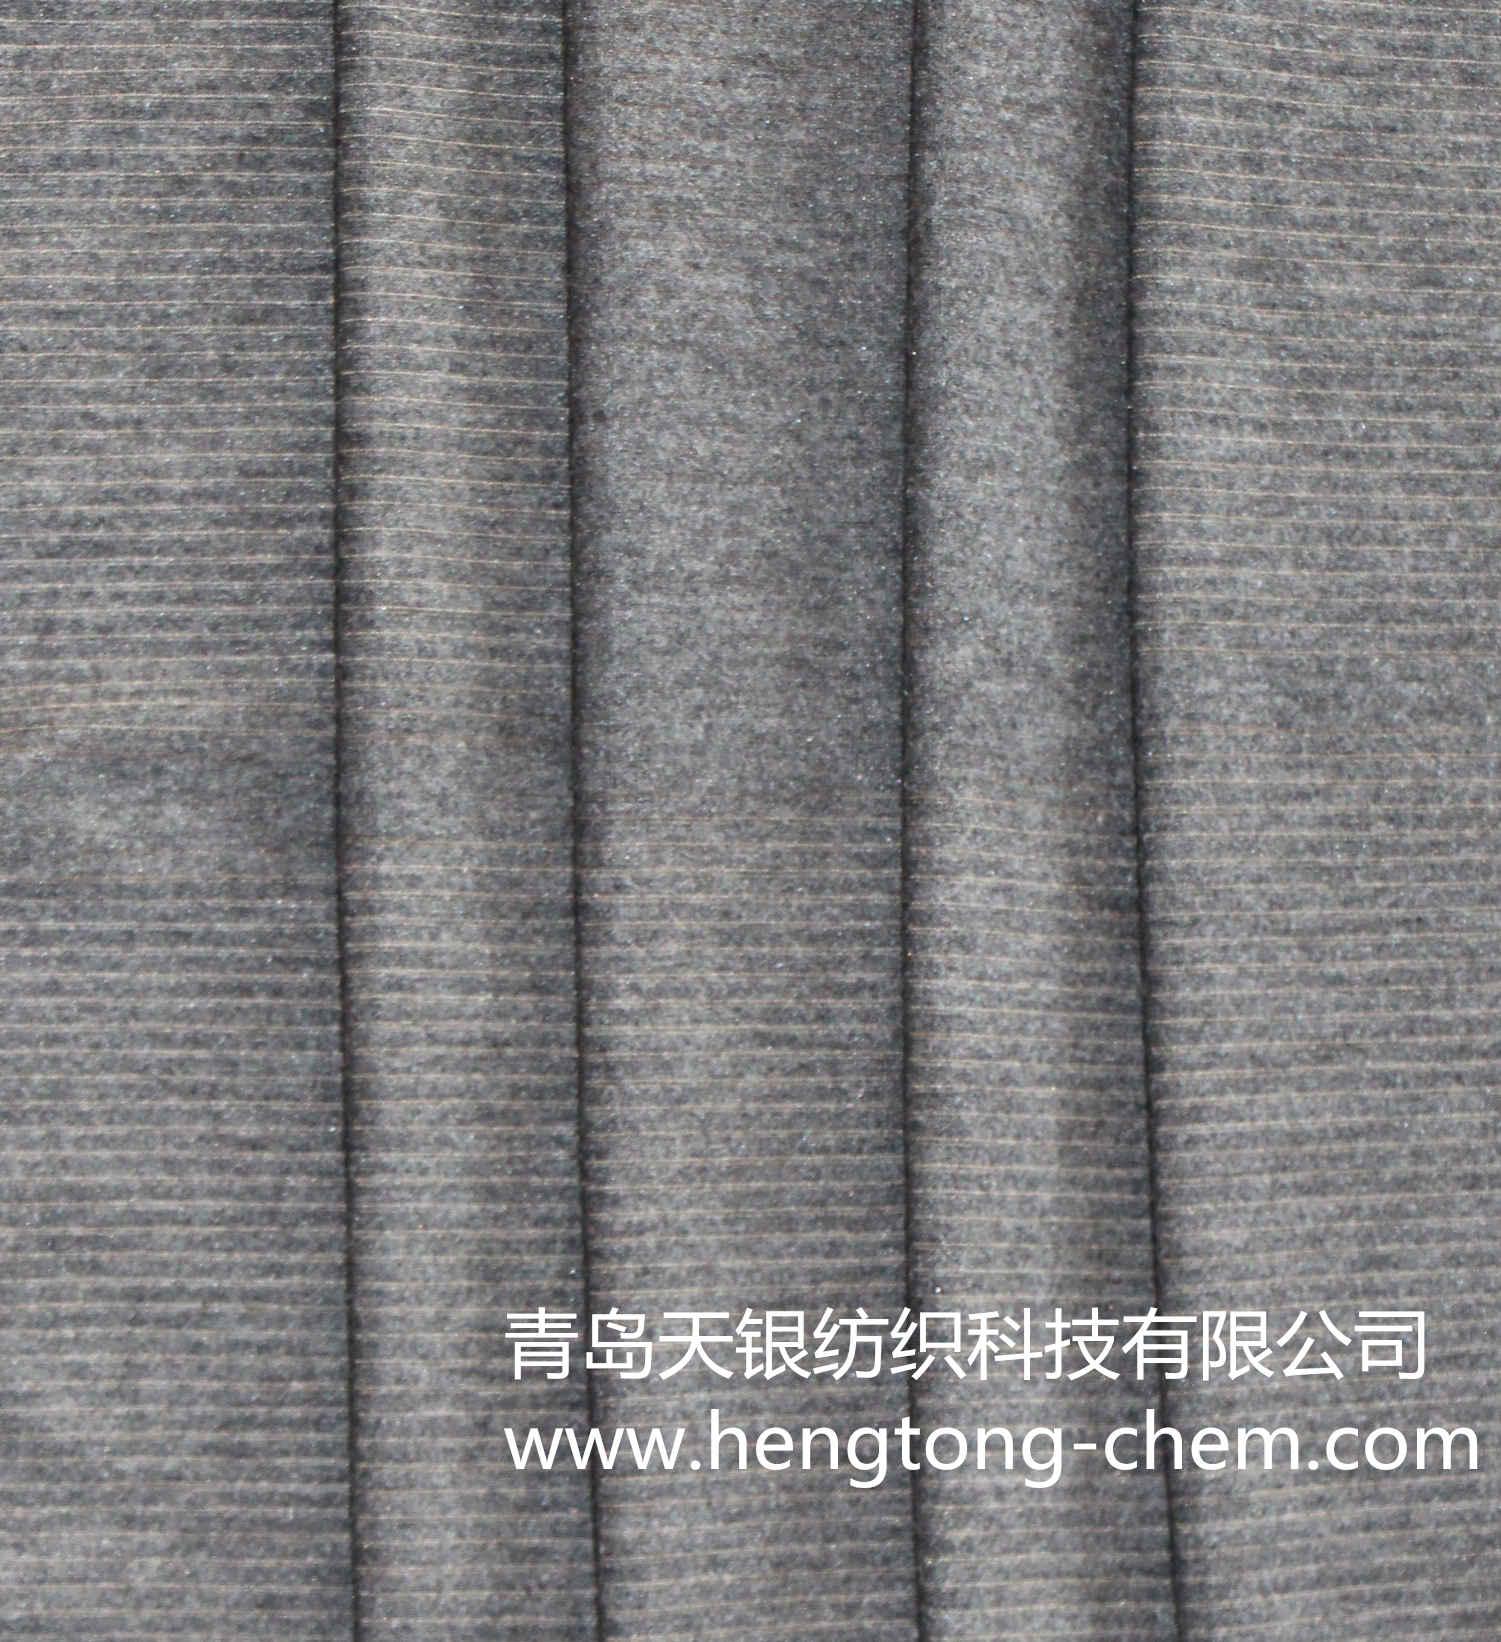 Silver fiber antibacterial underwear fabric - dark grey